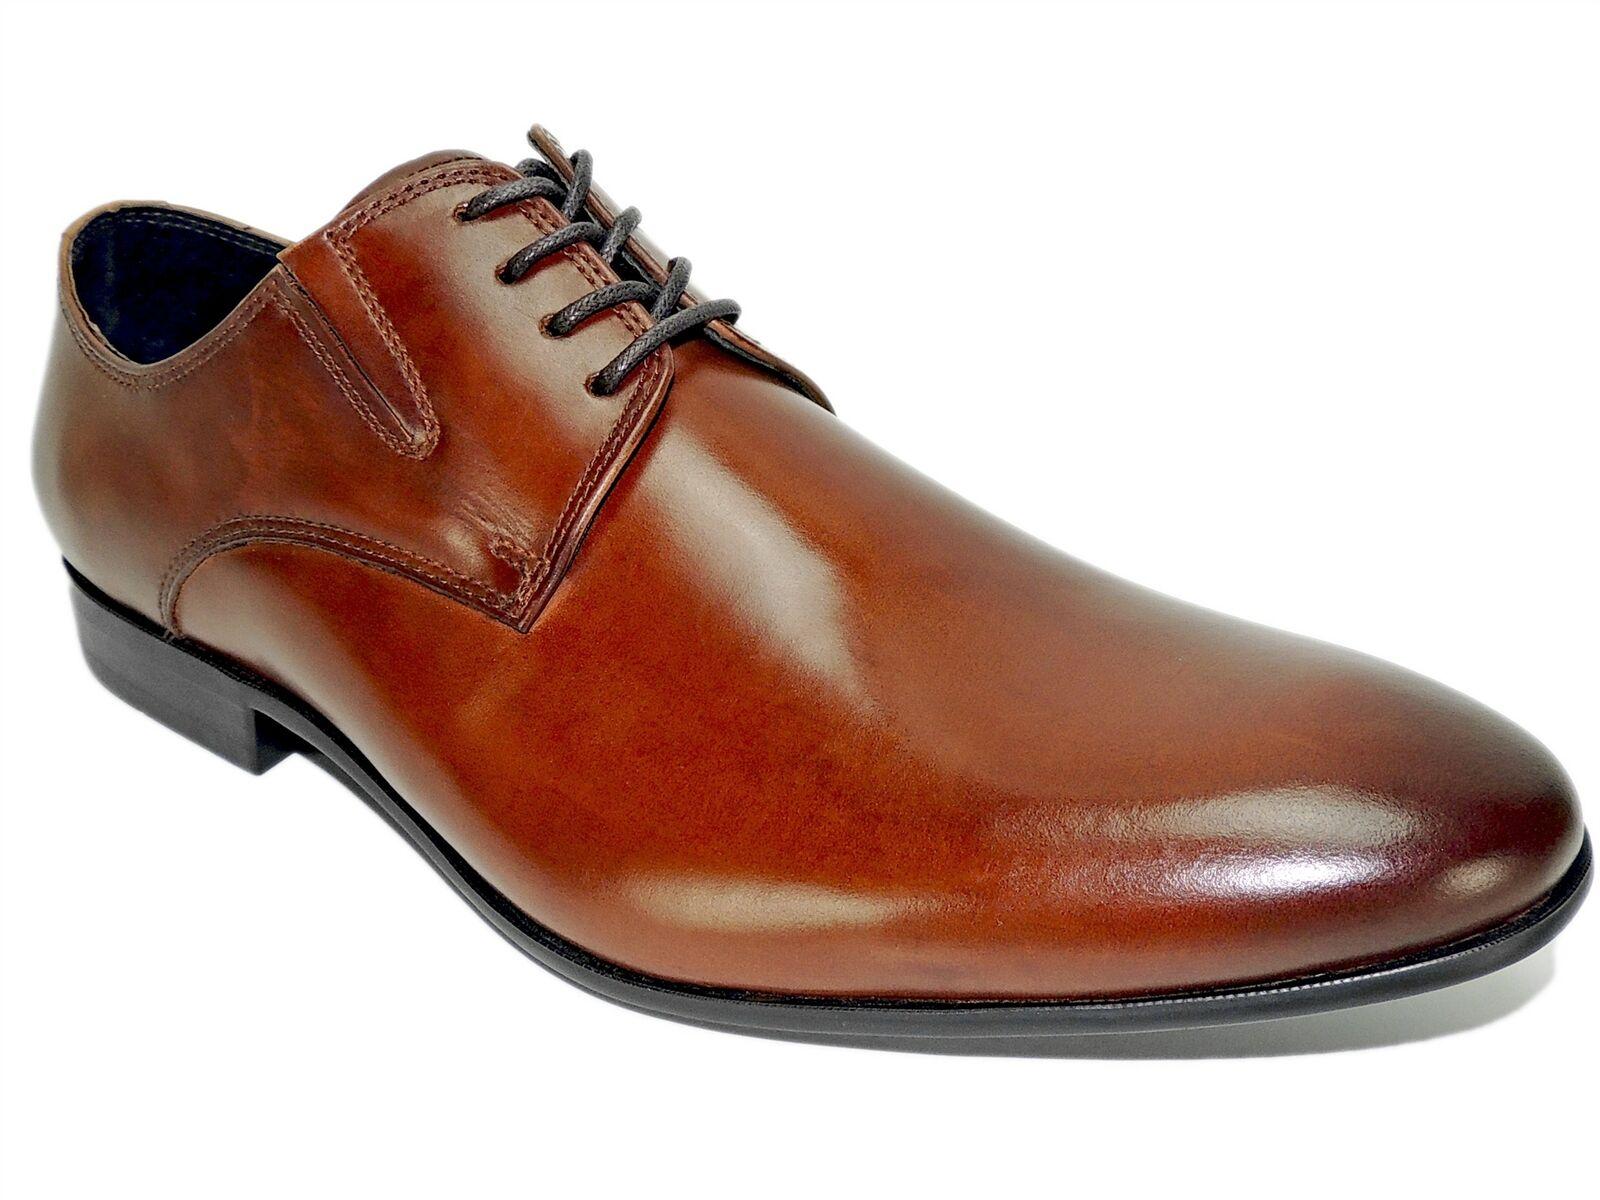 Kenneth Cole New York Men's Mix-Er Oxfords Cognac Leather Size 11 M